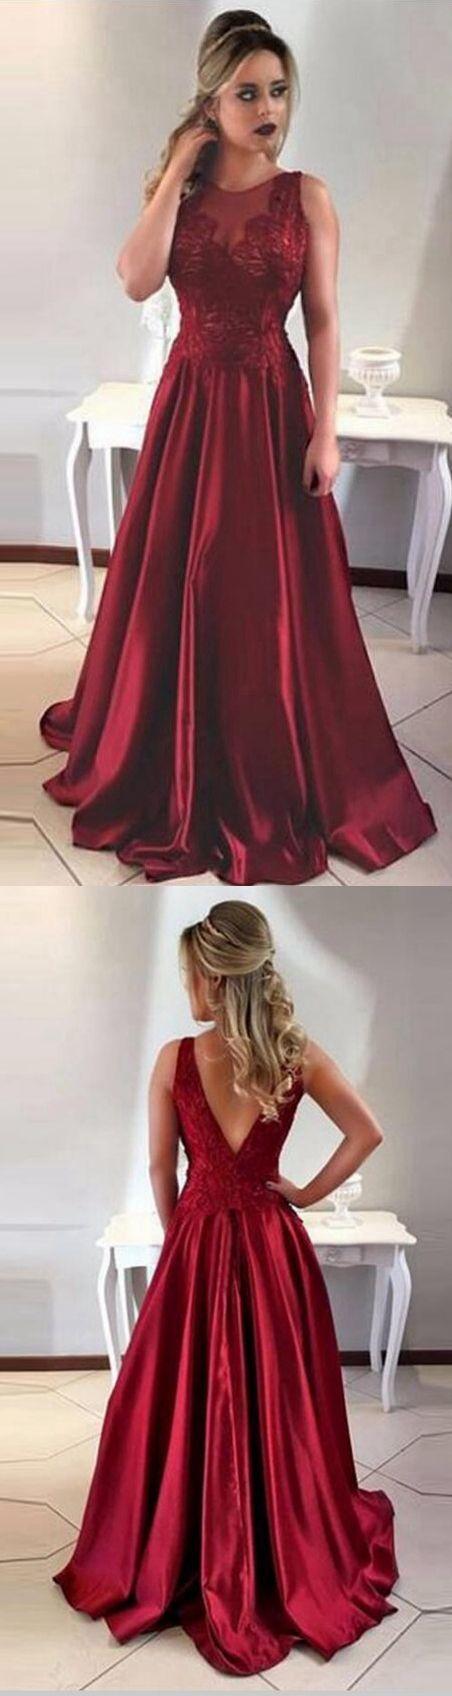 Sexy burgundy long prom dress, burgundy evening dress ,Long Prom Dress,Evening